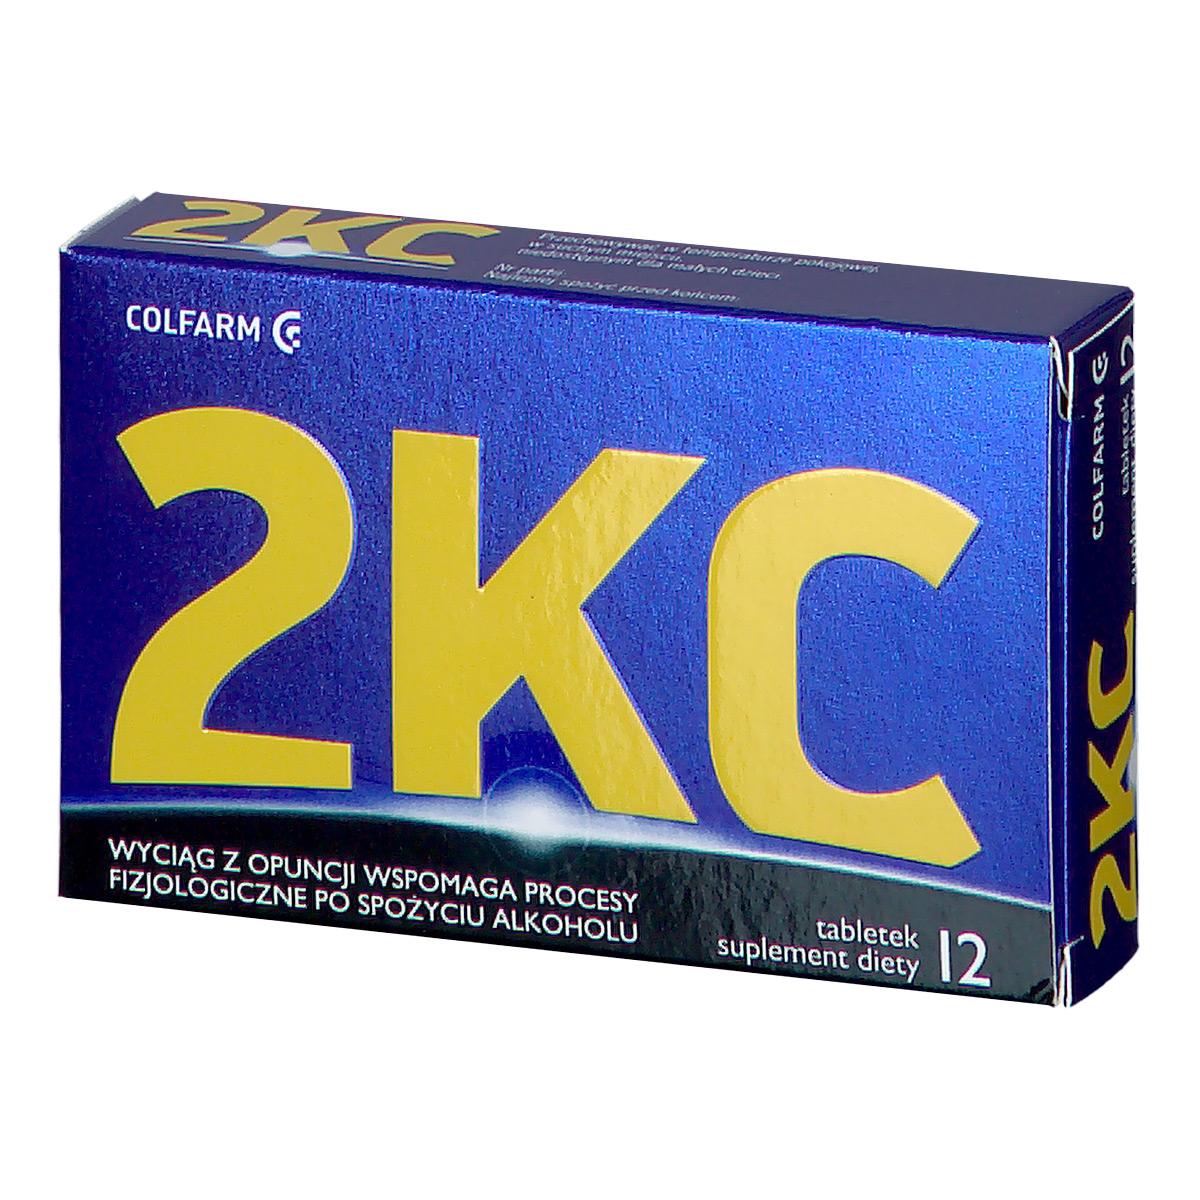 Image of 2 kc tabletki